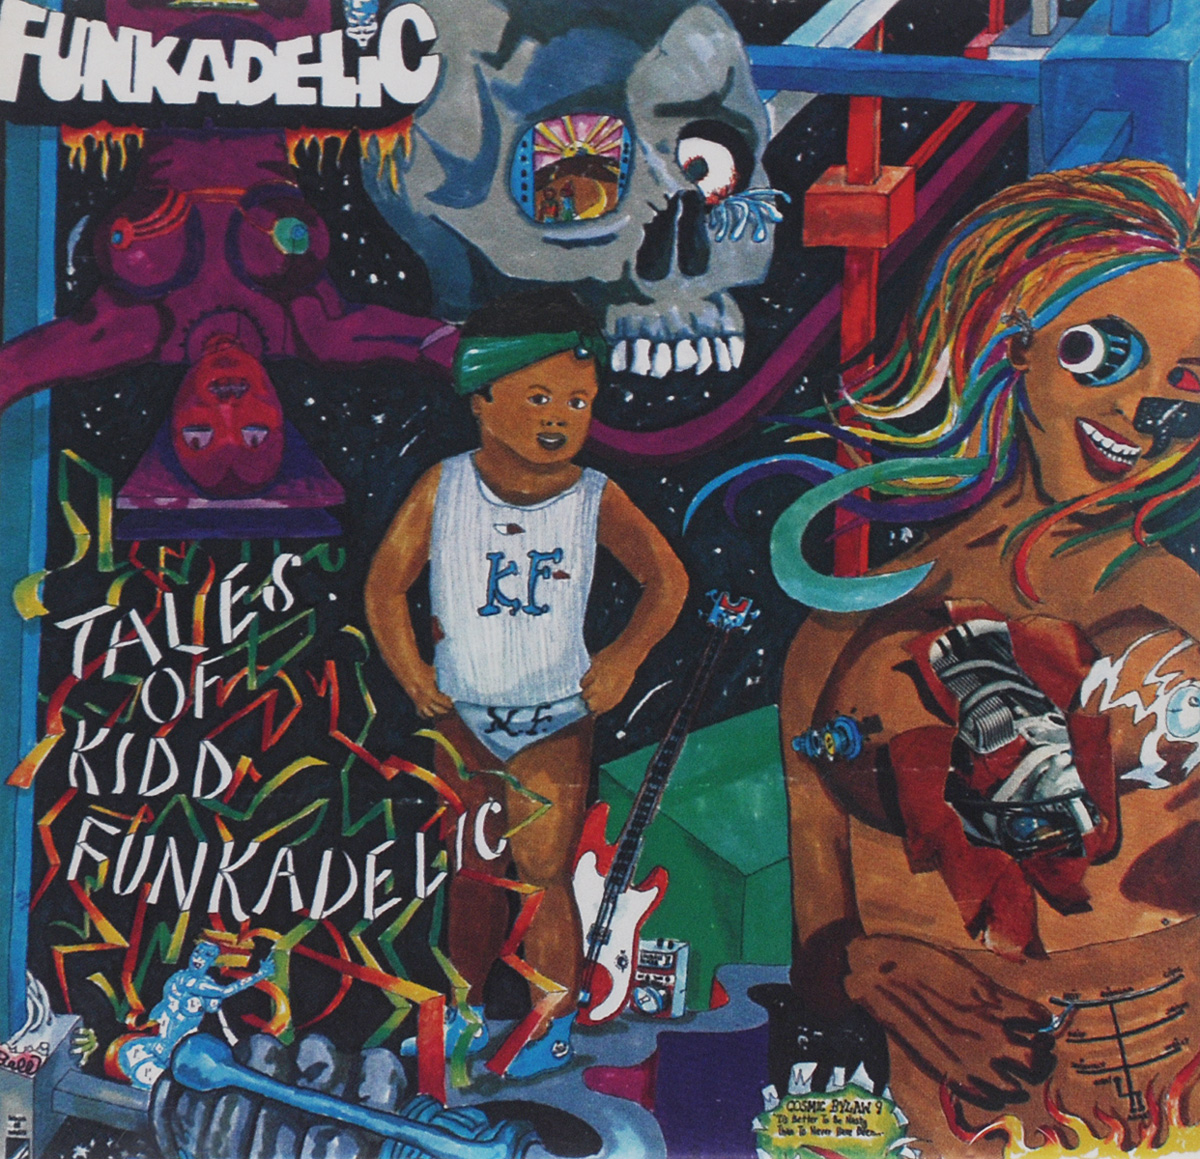 Funkadelic. Tales Of Kidd Funkadelic